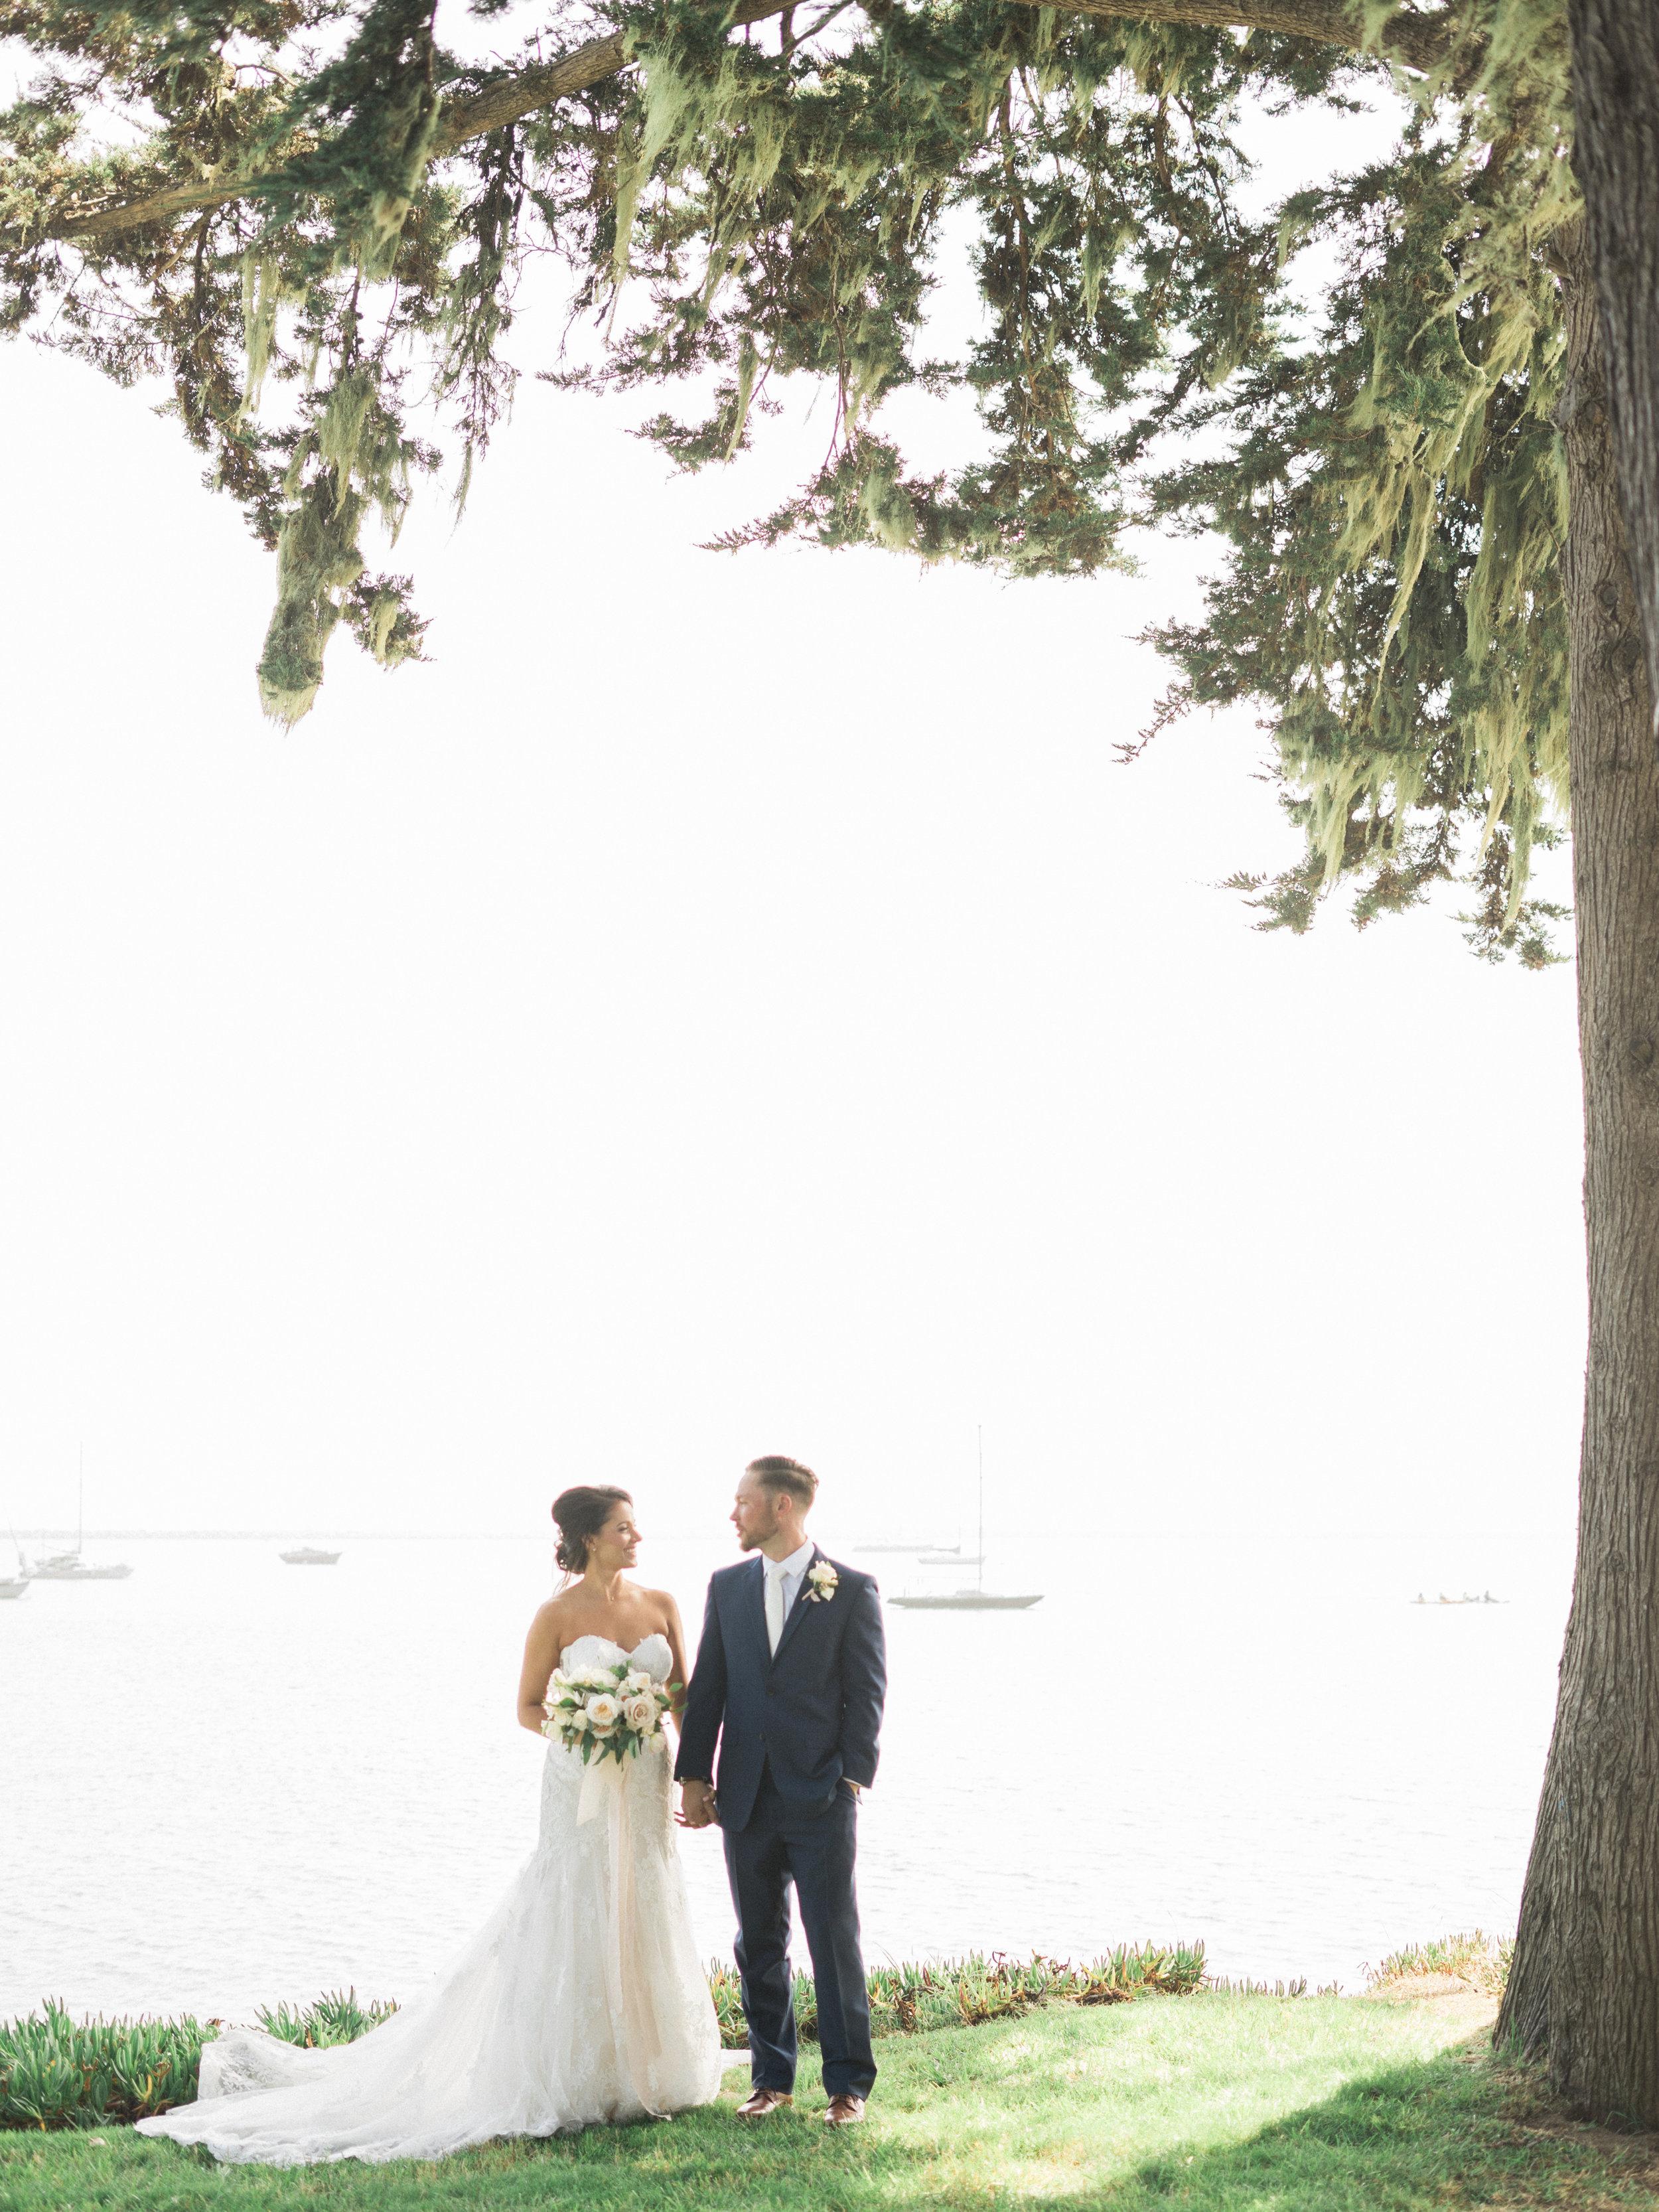 trynhphoto_socal_sf_halfmoon_bay_wedding_photographer_JA-126.jpg